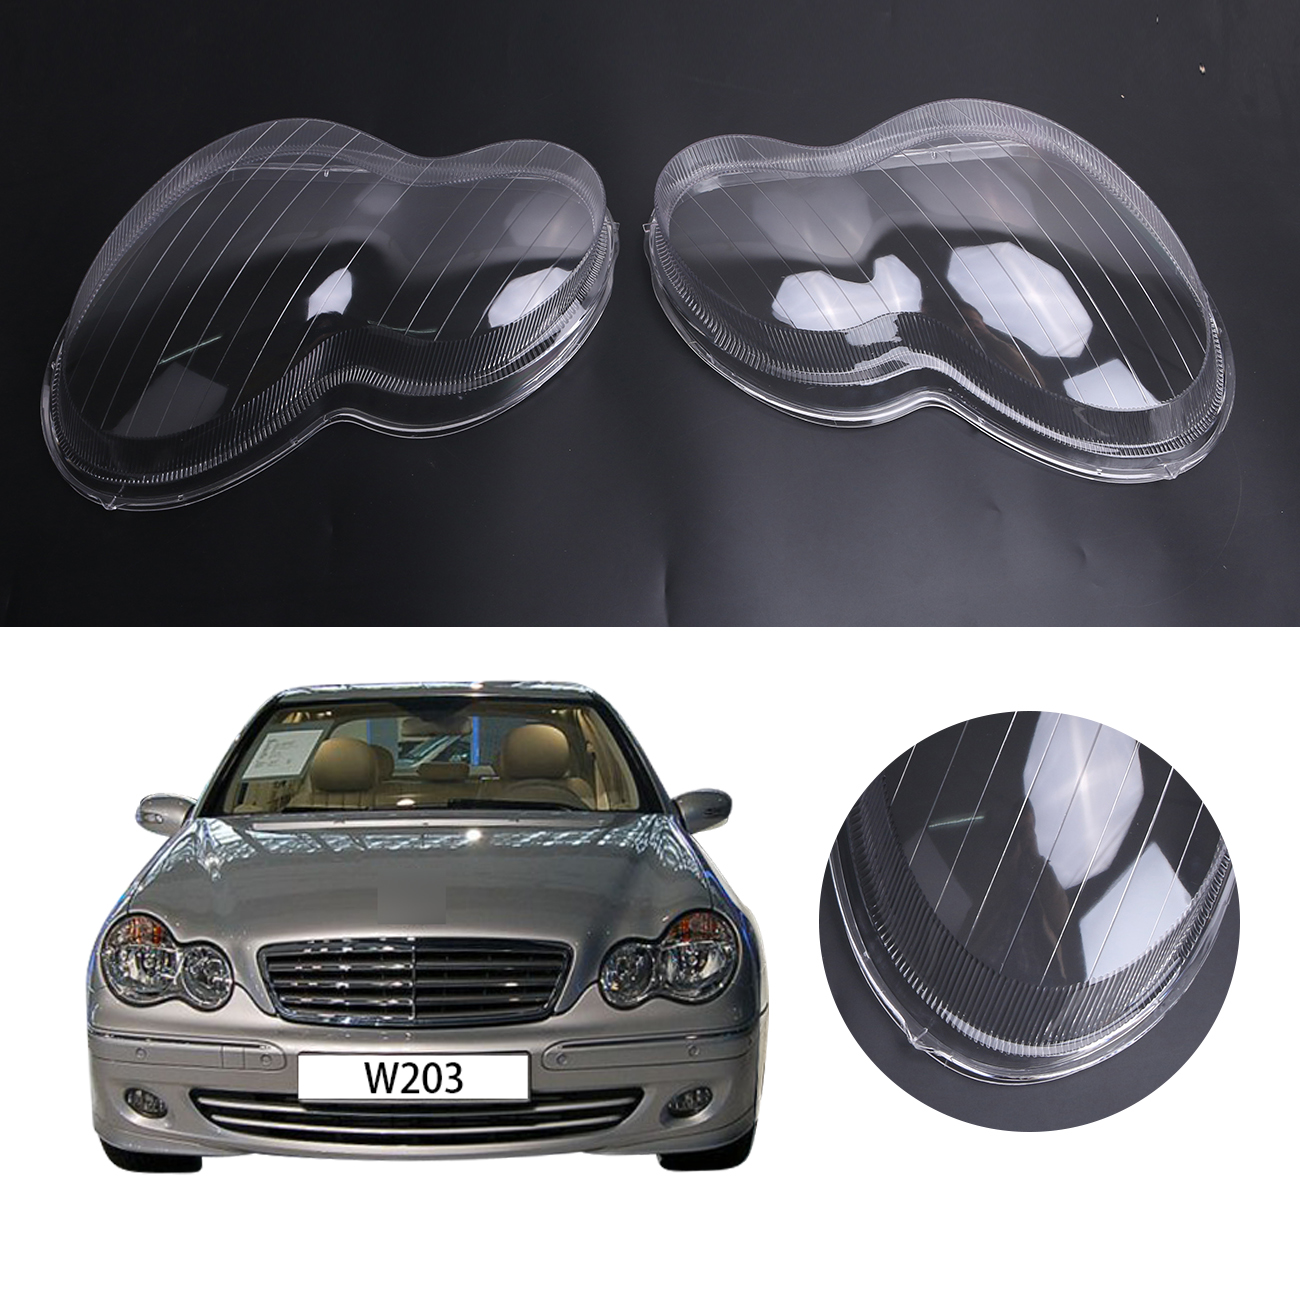 2x Transparent Housing Headlight Lens Shell Cover Lamp Assembly For Mercedes Benz W203 4-Door C230 C200 C240 2001-2007 #PD553 gt1238 708837 0001 1600960499 708837 turbocharger housing turbine housing for mercedes benz smart m160 0 6l